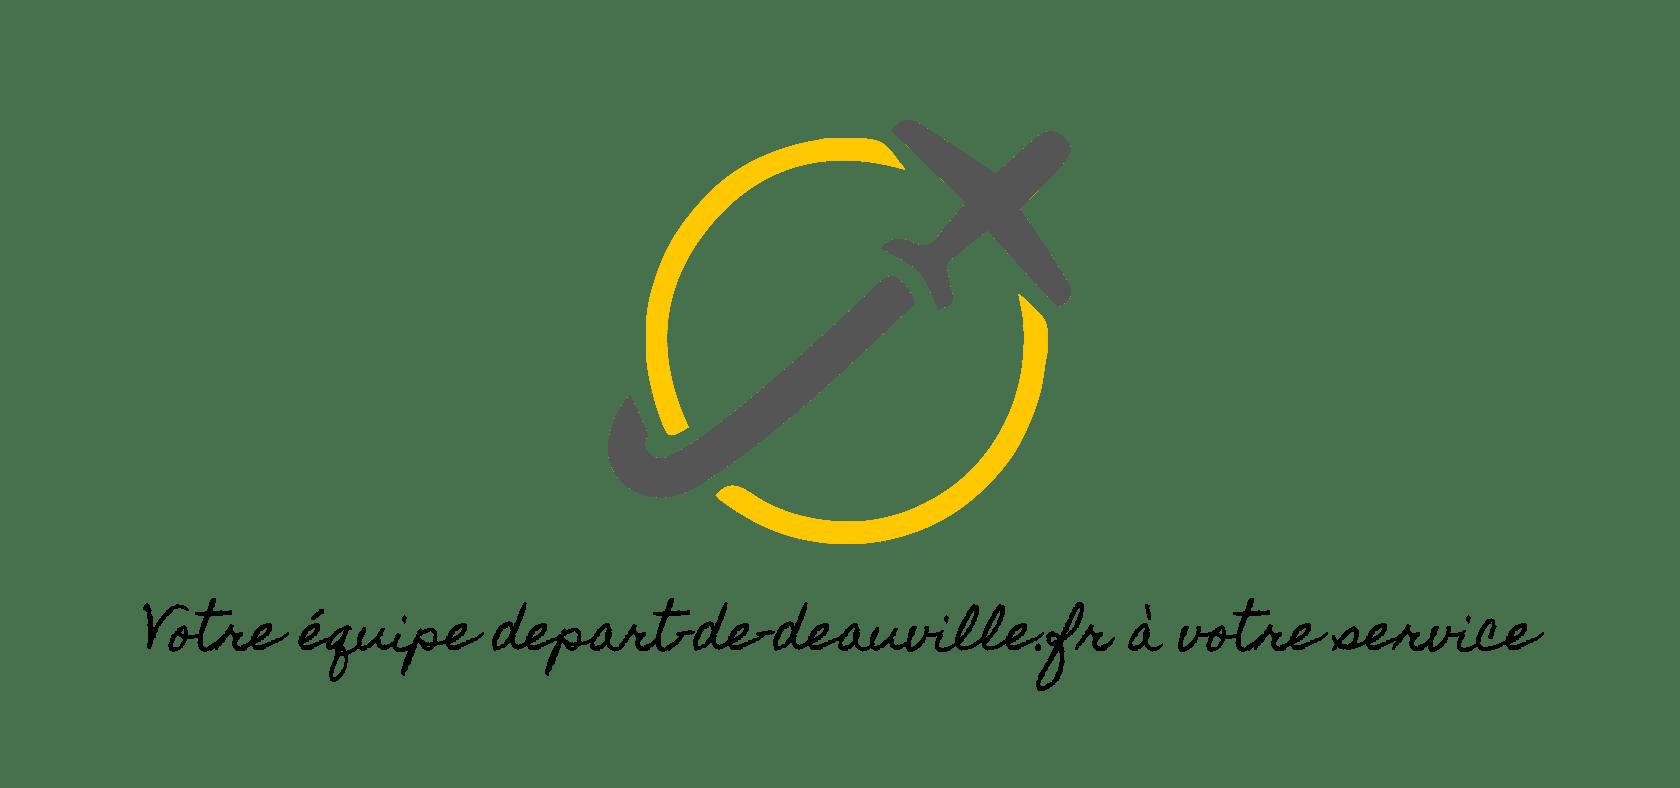 Signature logo depart-de-deauville.fr